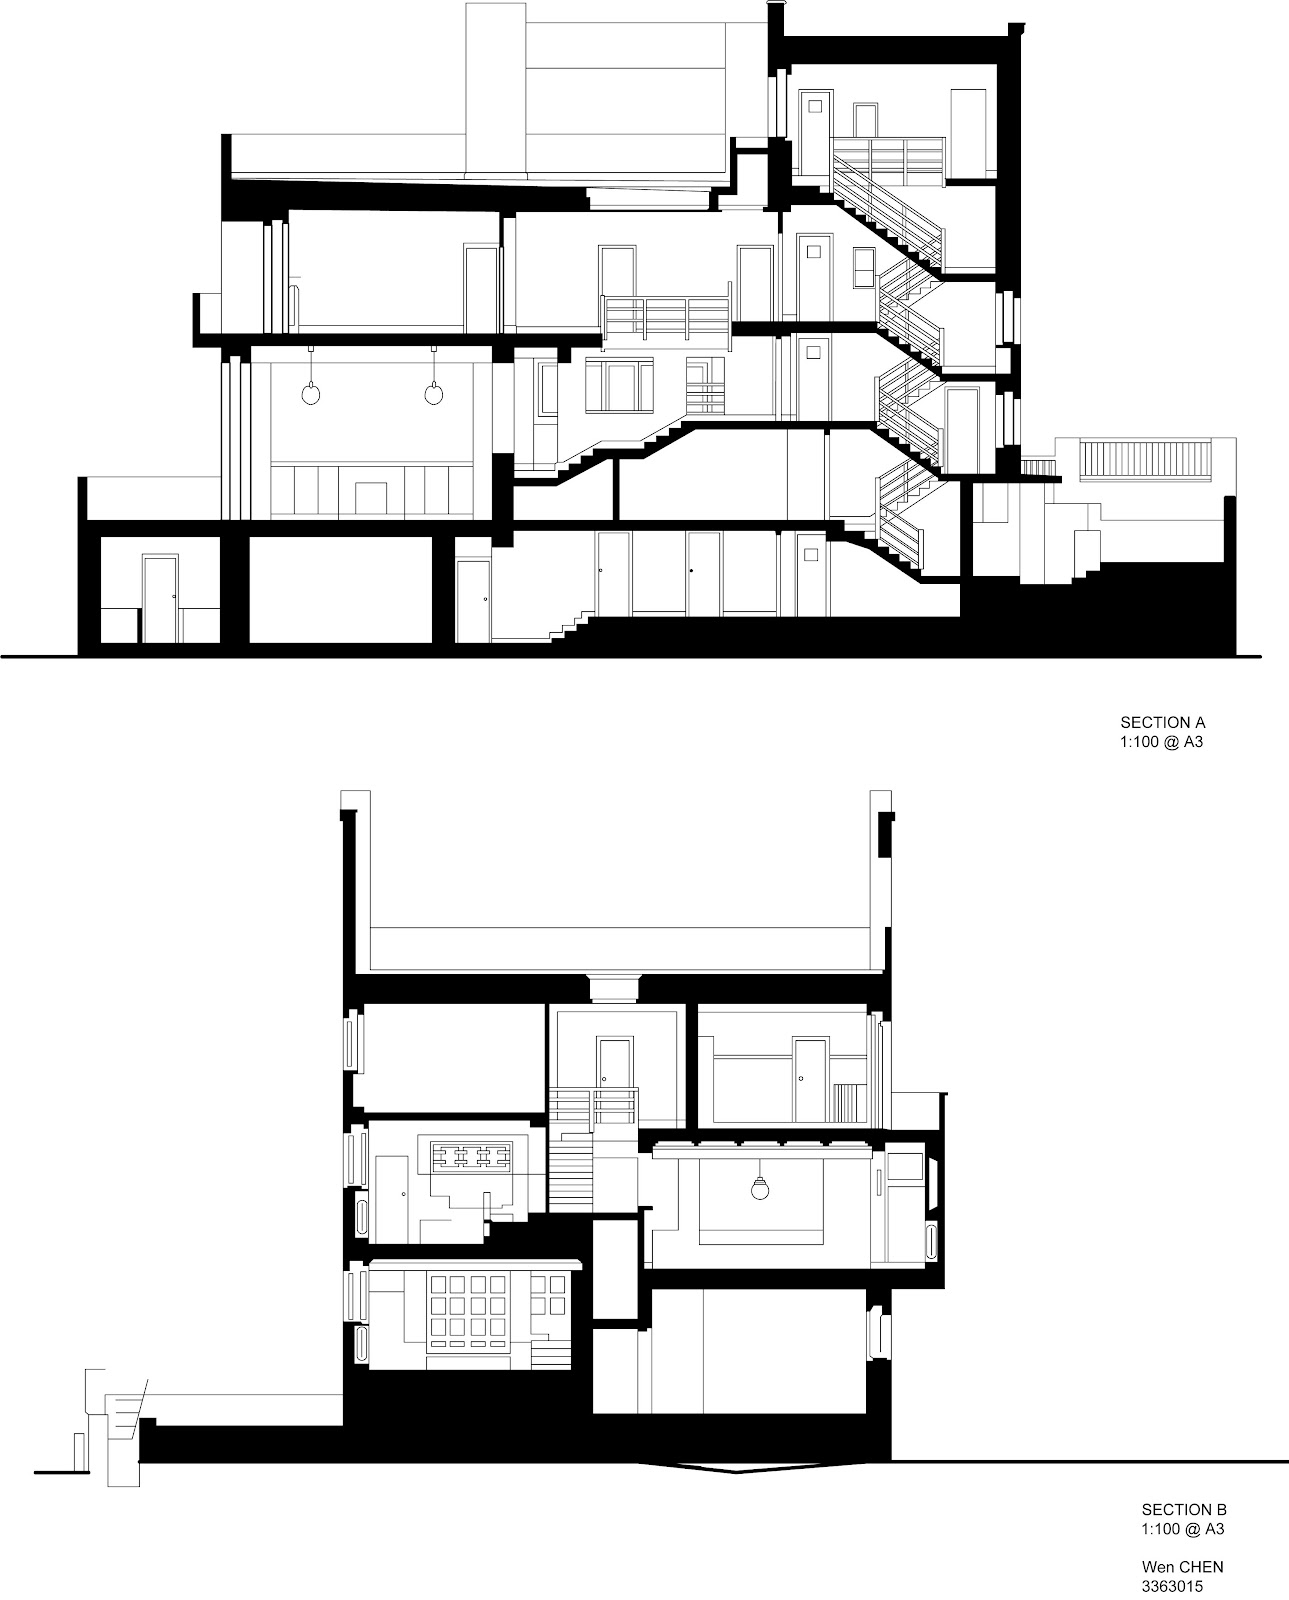 Photo Villa Savoye Floor Plans Images Savoye Floor